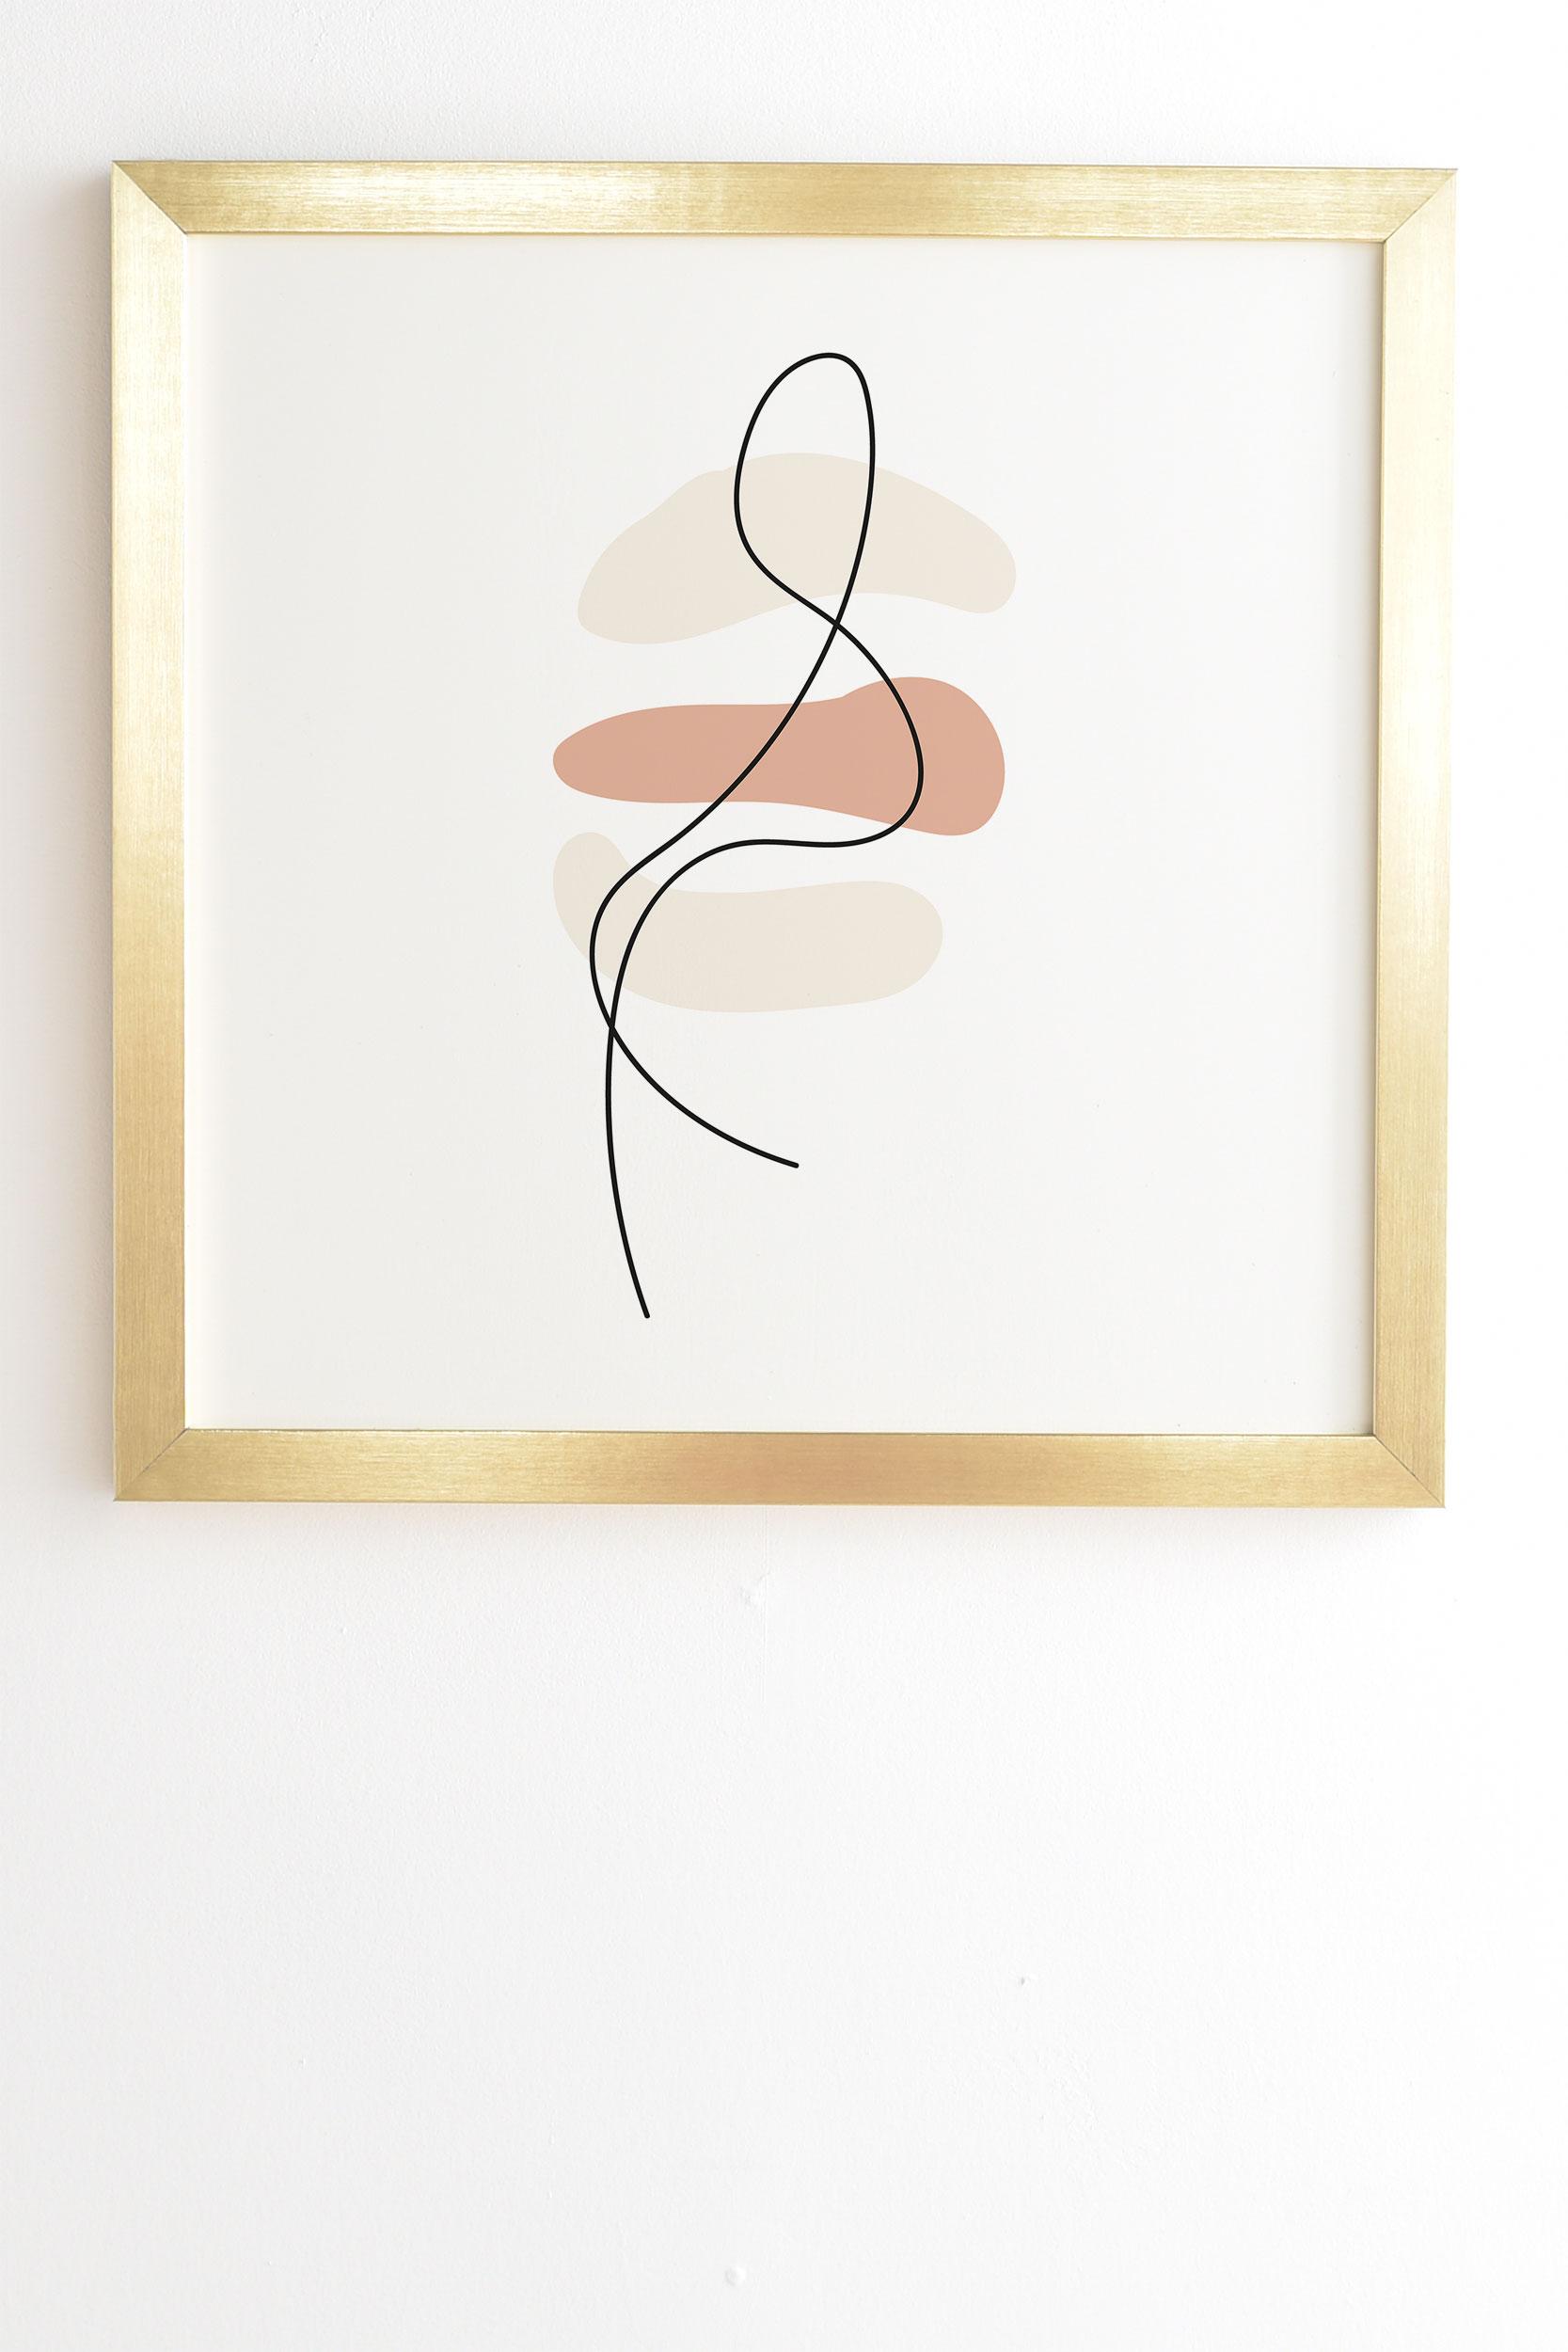 "Abstract Minimal Line Beige by Mambo Art Studio - Framed Wall Art Basic Gold 19"" x 22.4"""